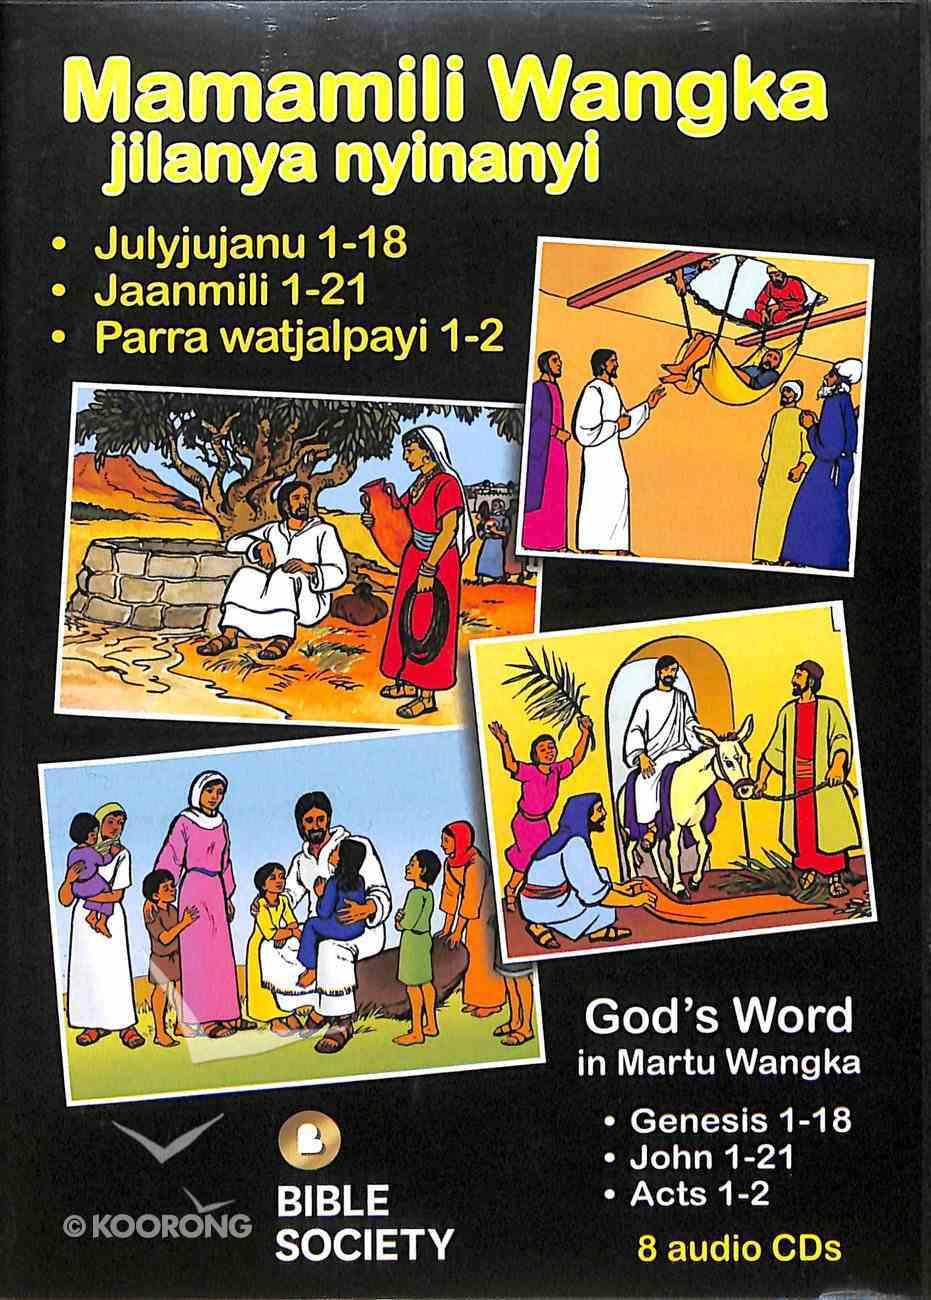 God's Word (Martu Wangka) (8 Cd Set) CD